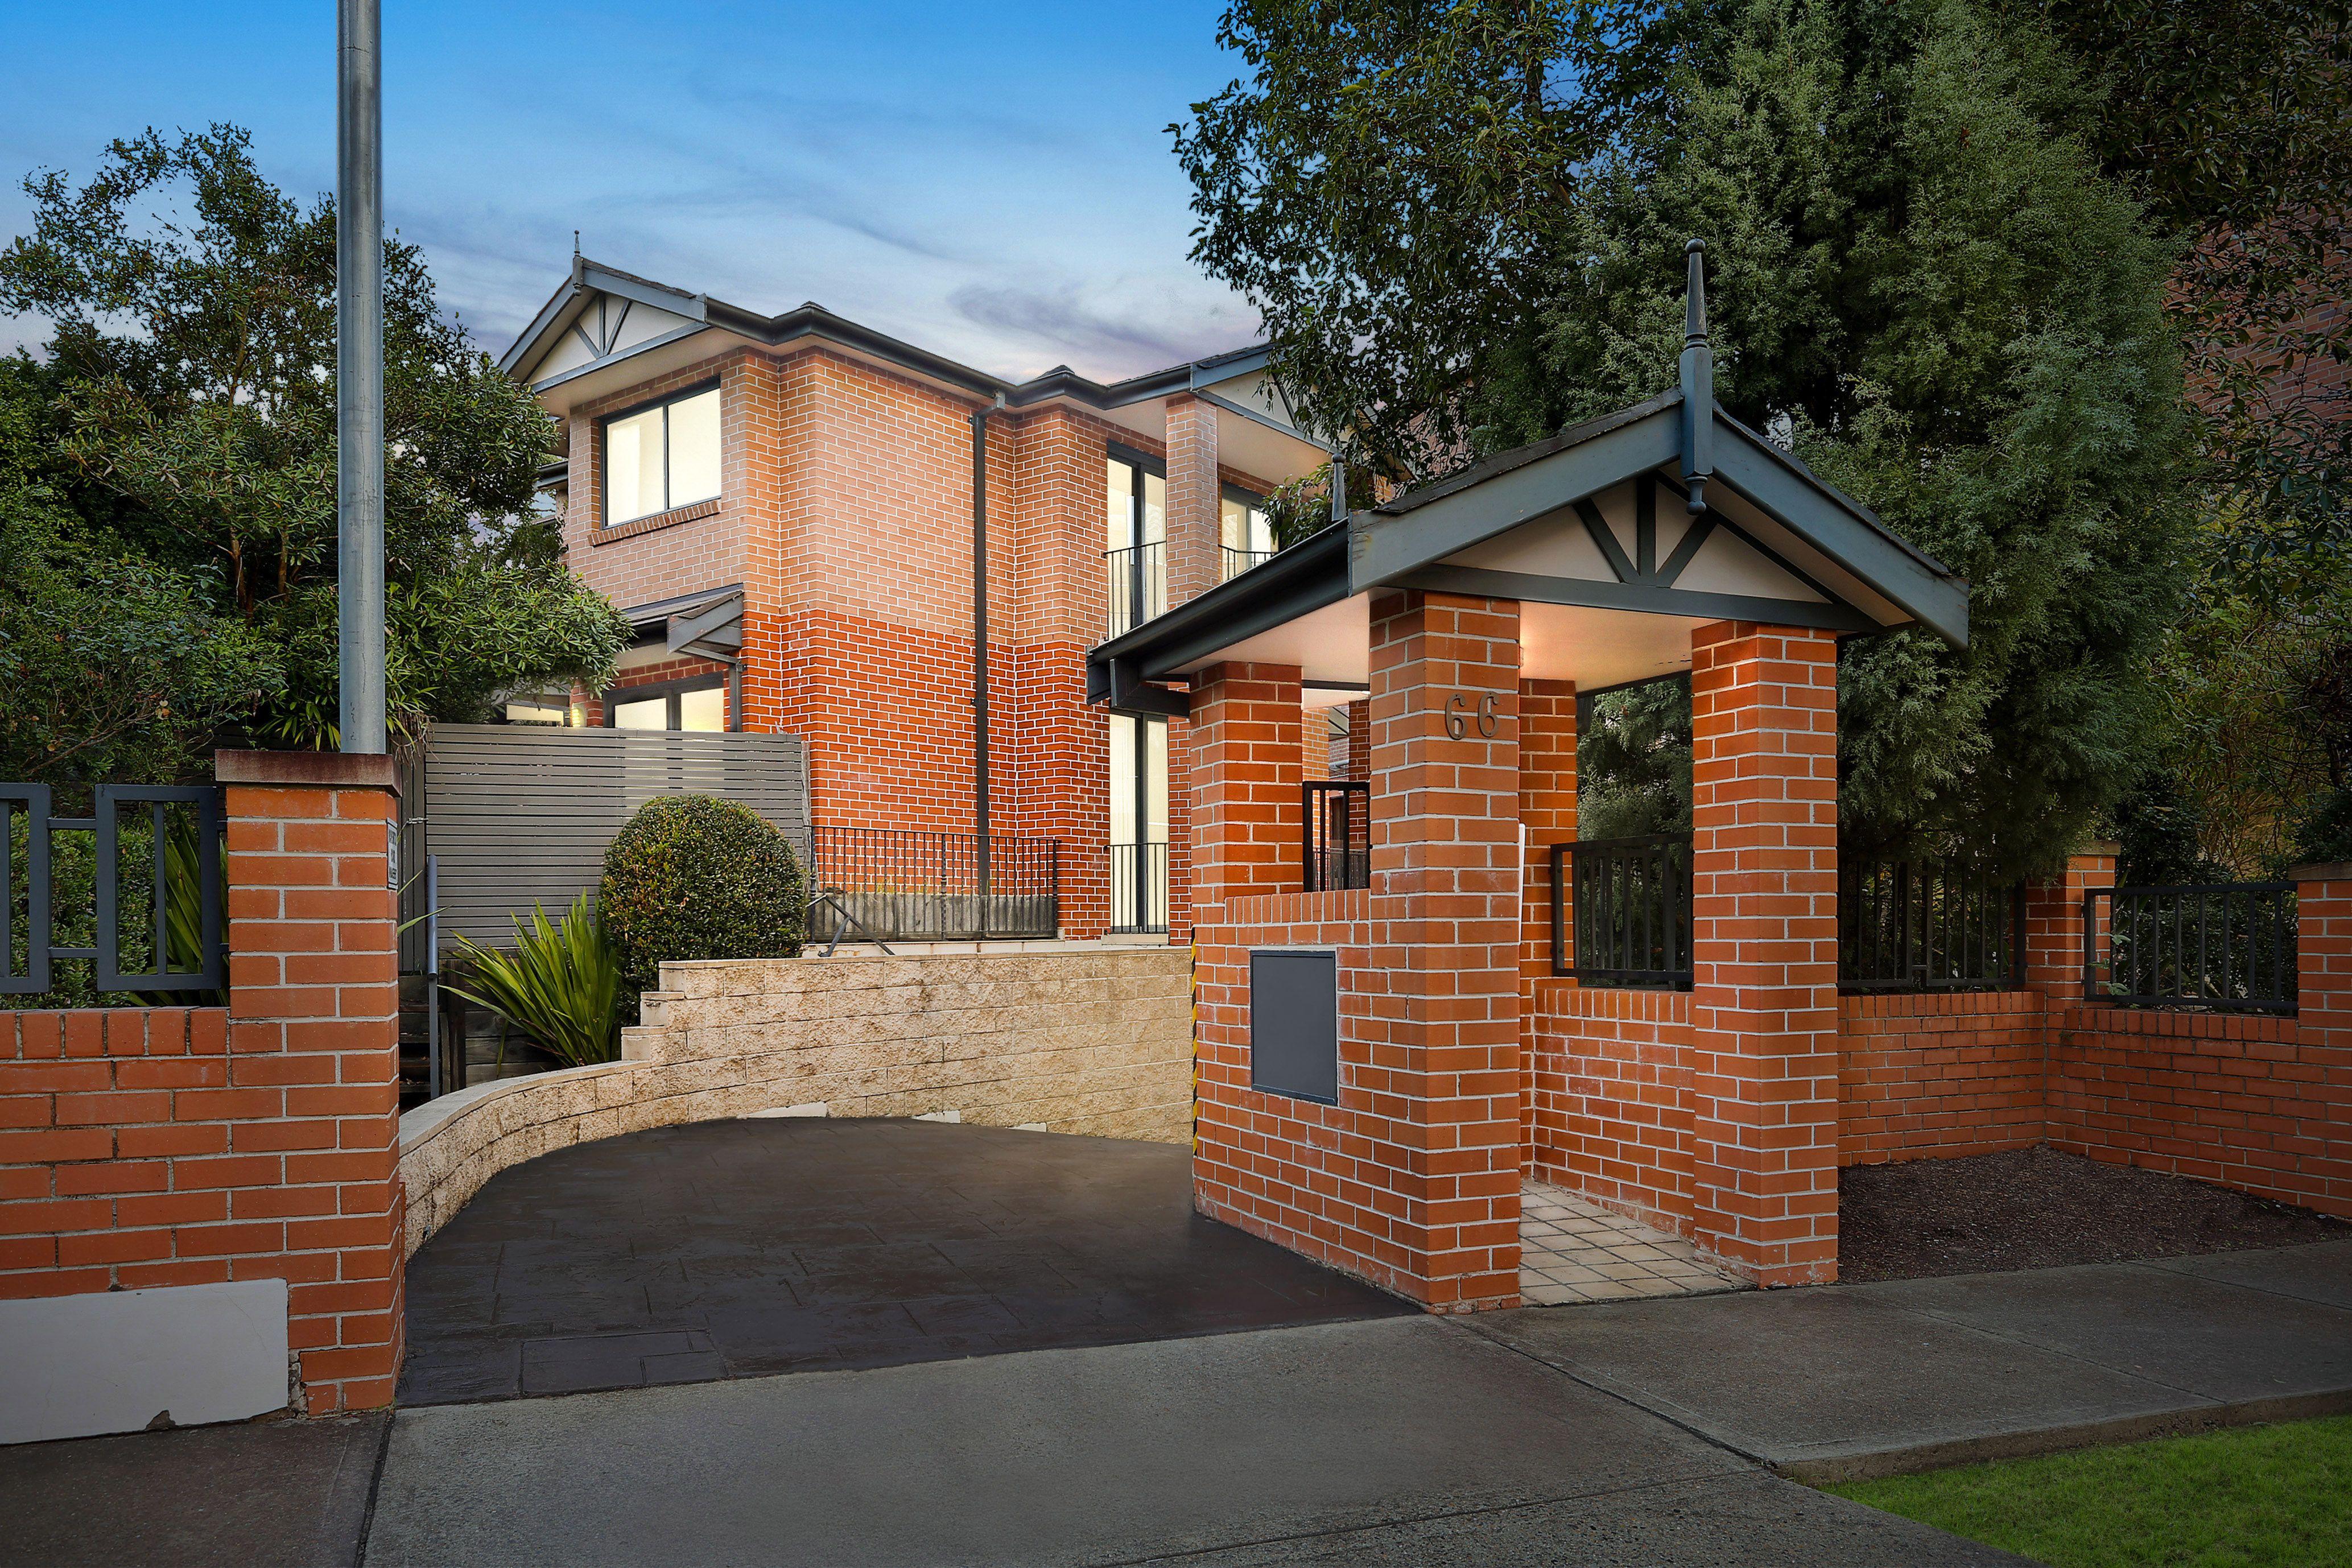 4/66 Beresford Road, Strathfield NSW 2135